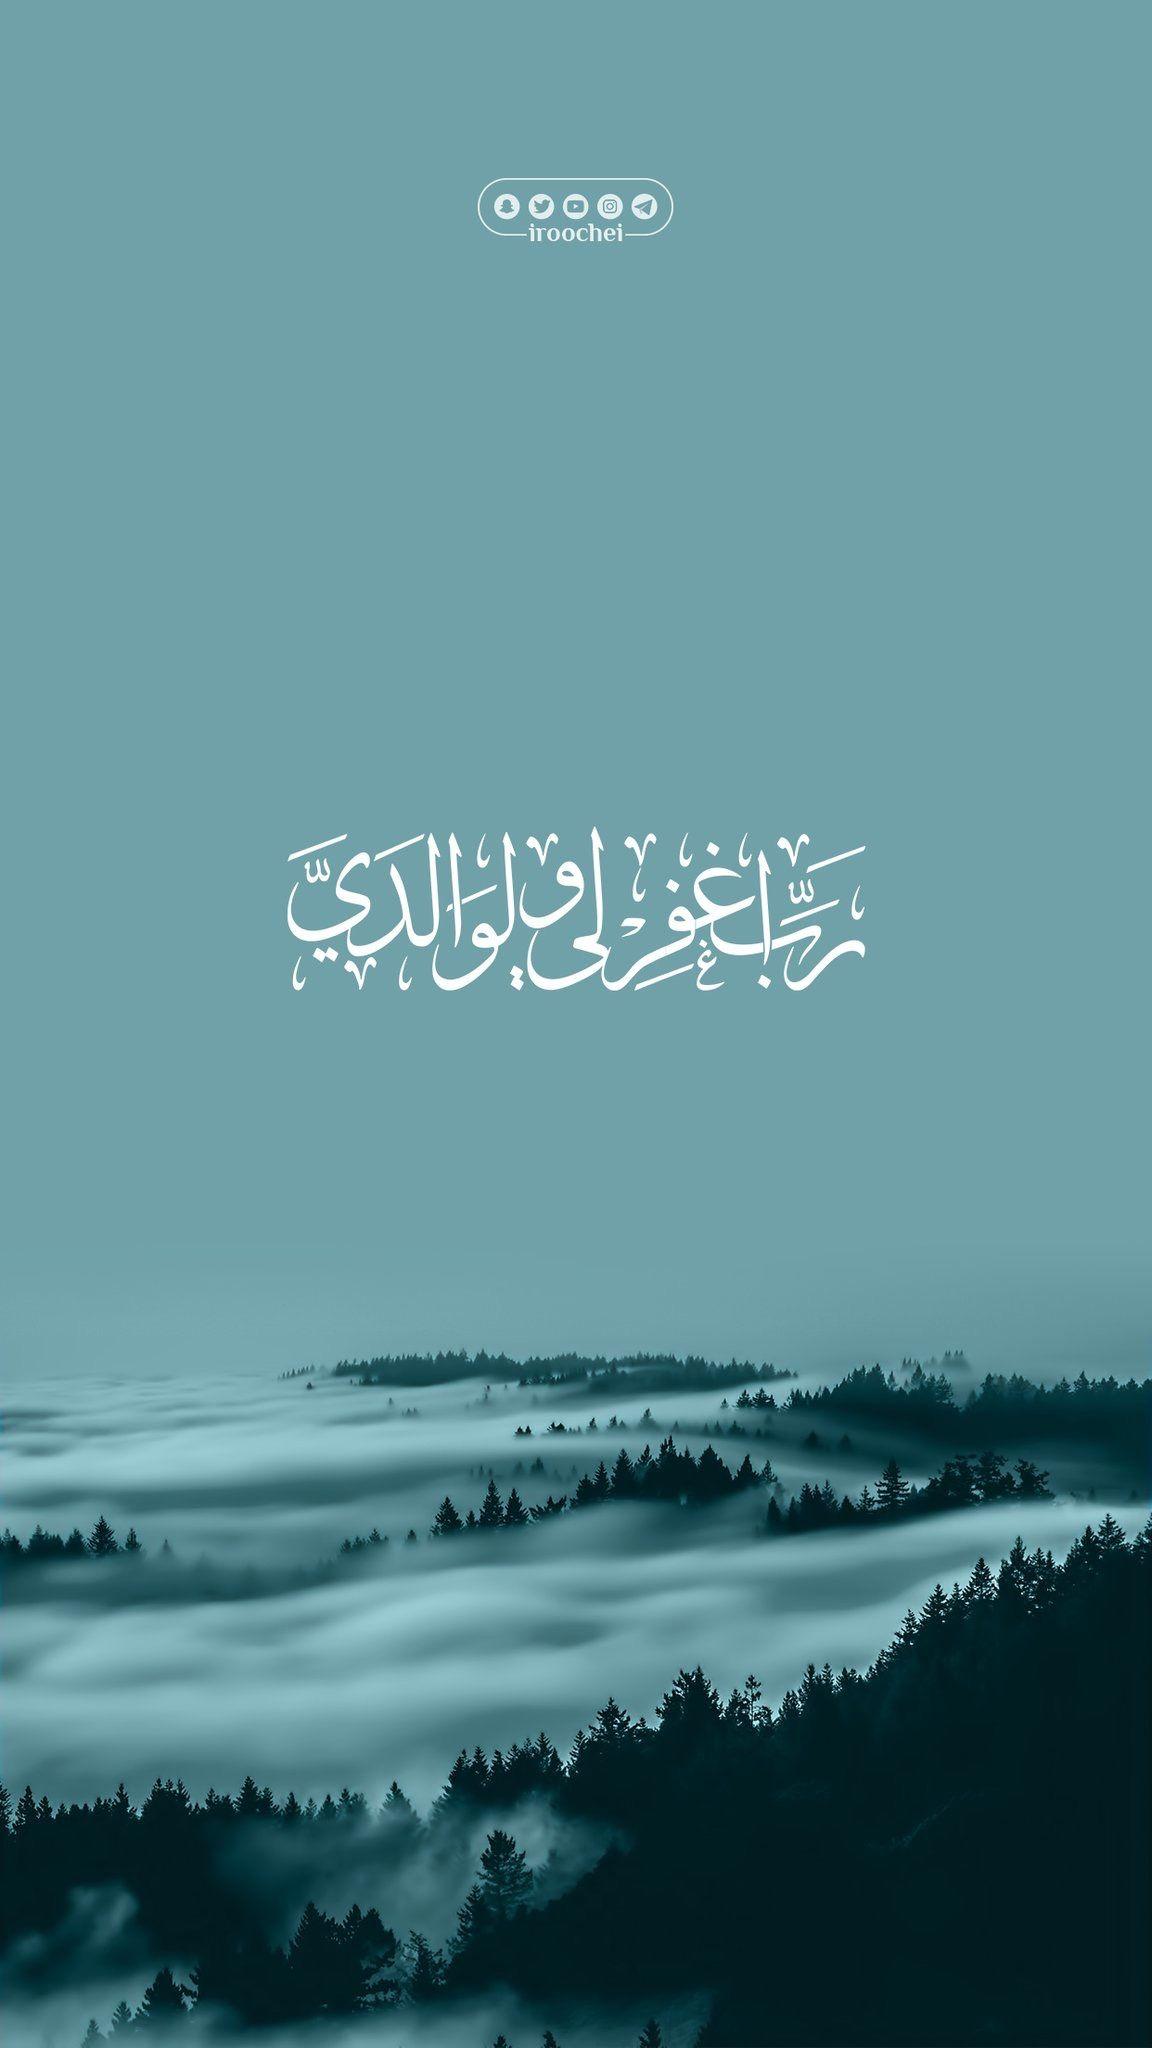 Pin By Saħ Bi On أجيب دعوة الداعي Quran Quotes Beautiful Quran Quotes Quran Quotes Inspirational